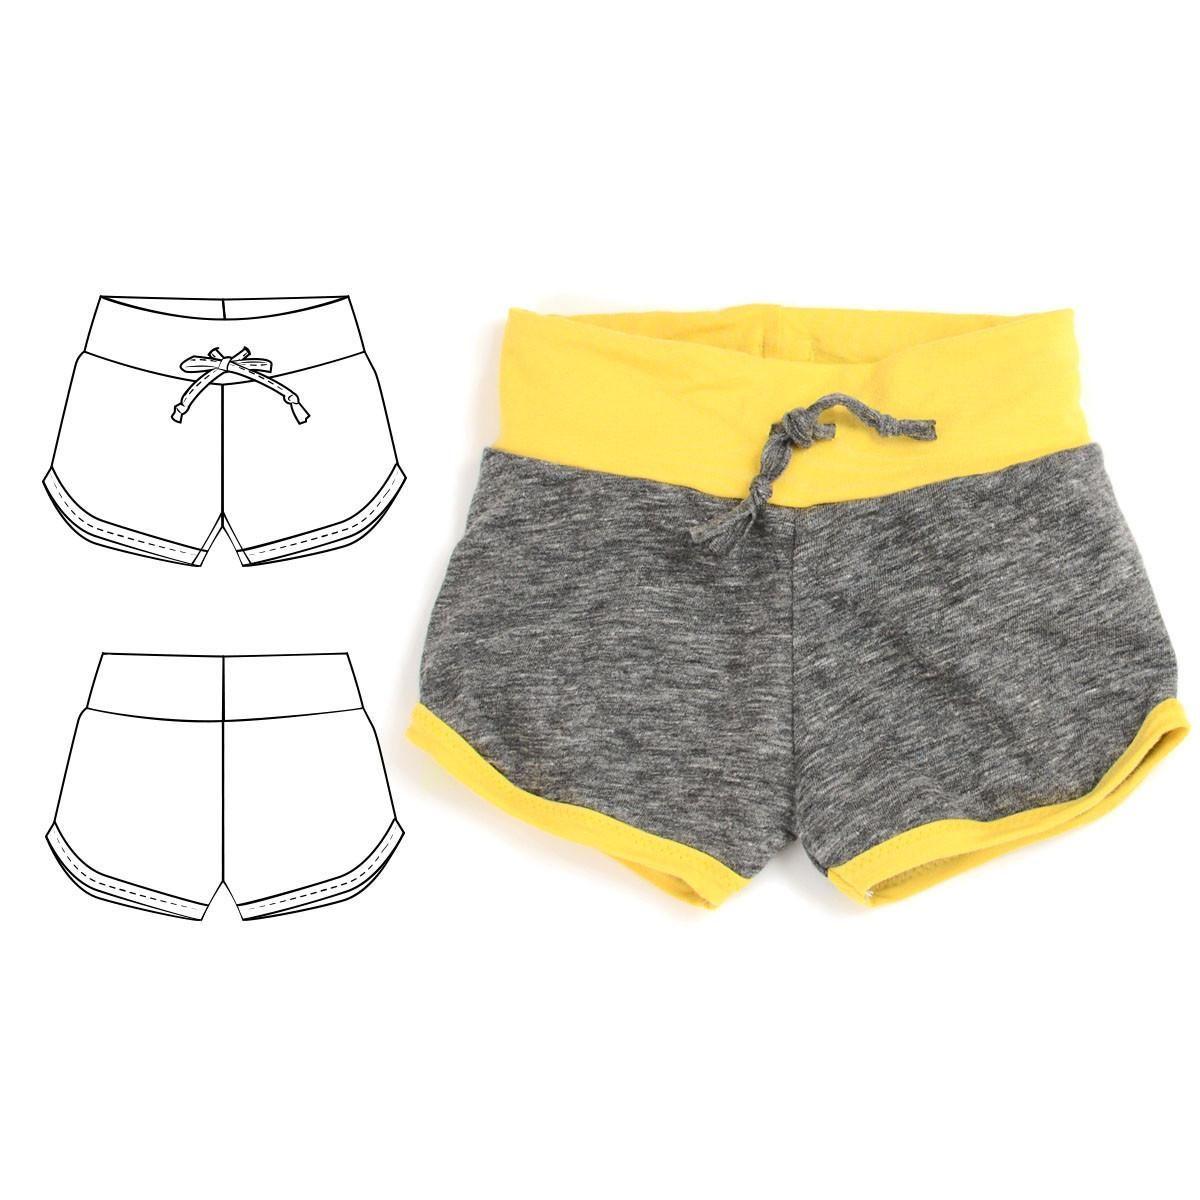 Retro shorts : 20 | Pinterest